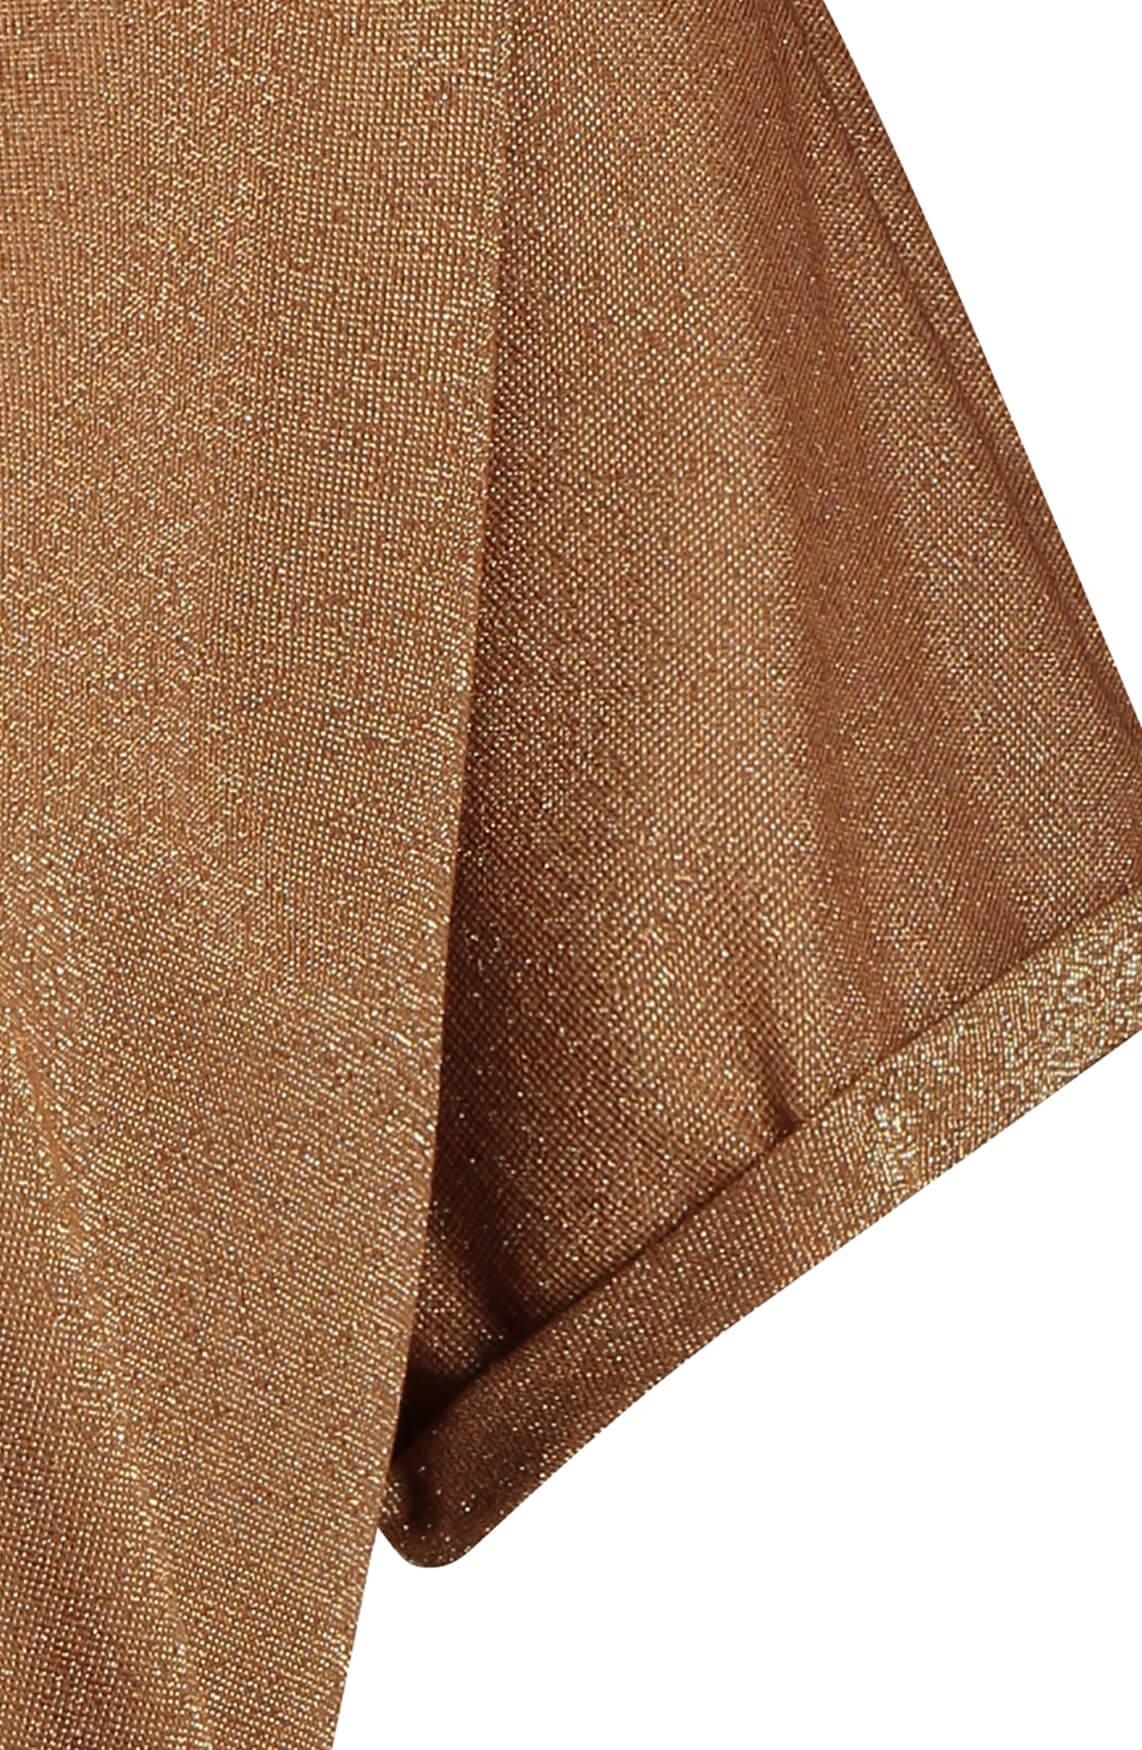 Jane Lushka Dames Hope glitter shirt Bruin